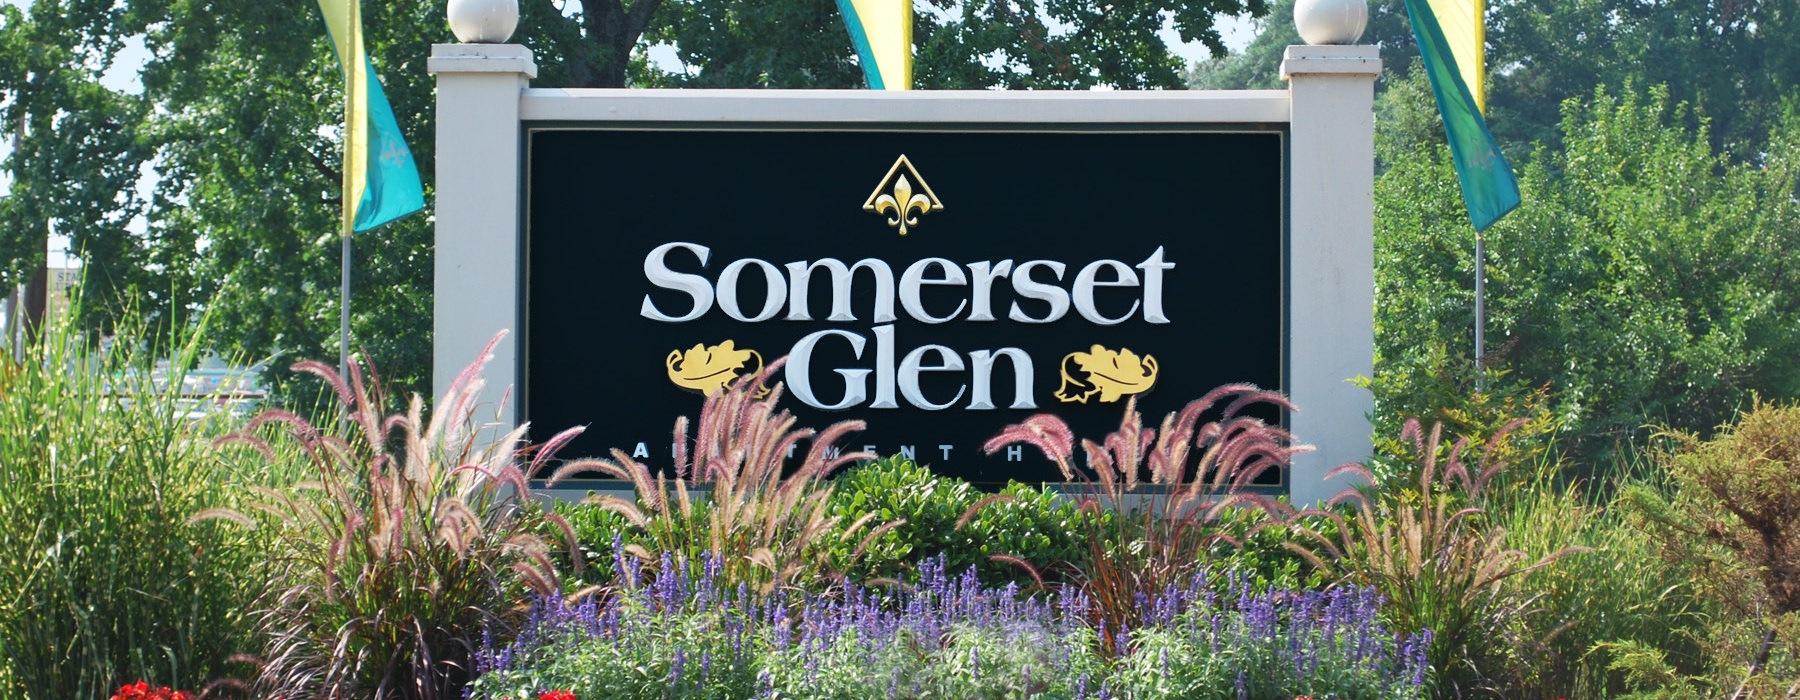 Somerset Glen